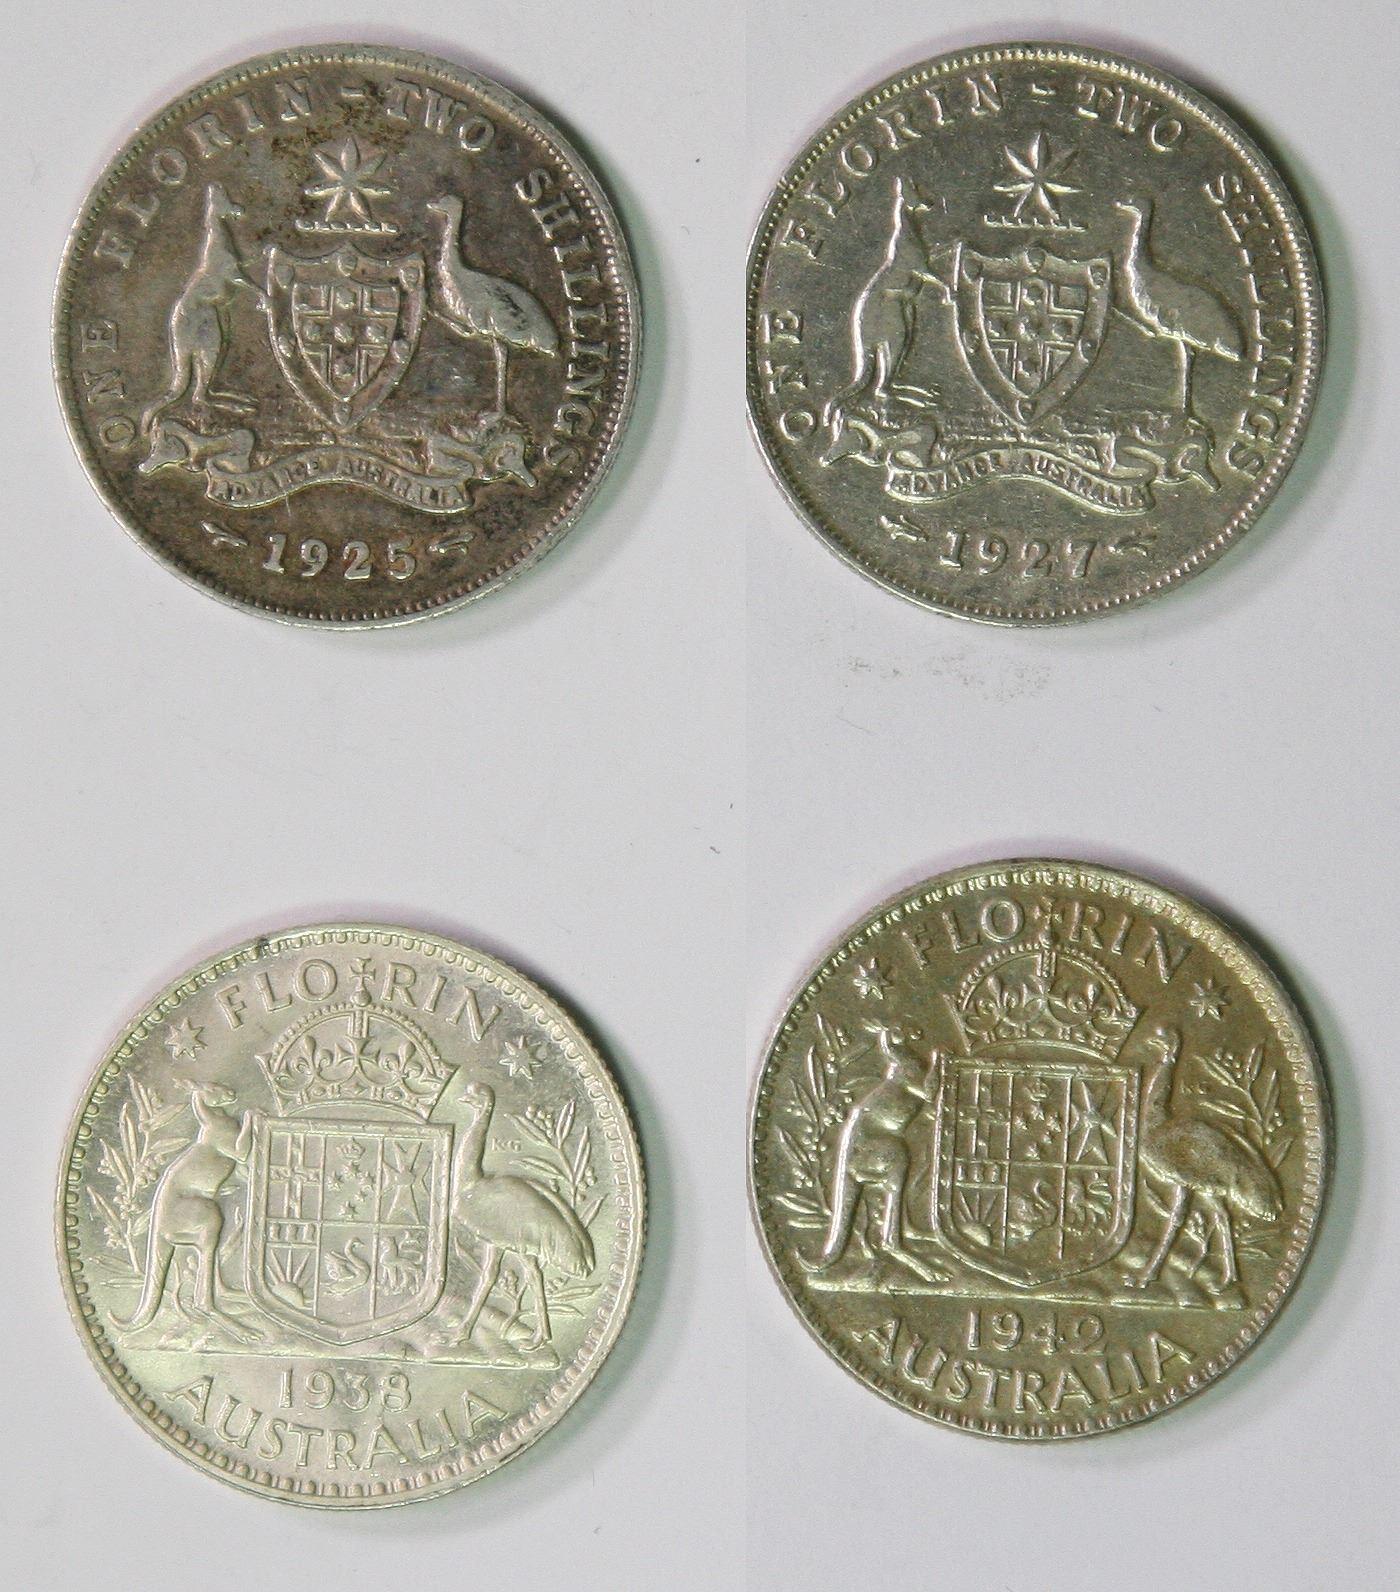 Australien & Ozeanien Kursmünzen, Einzelne Australia 1 Florin 1938 Unc